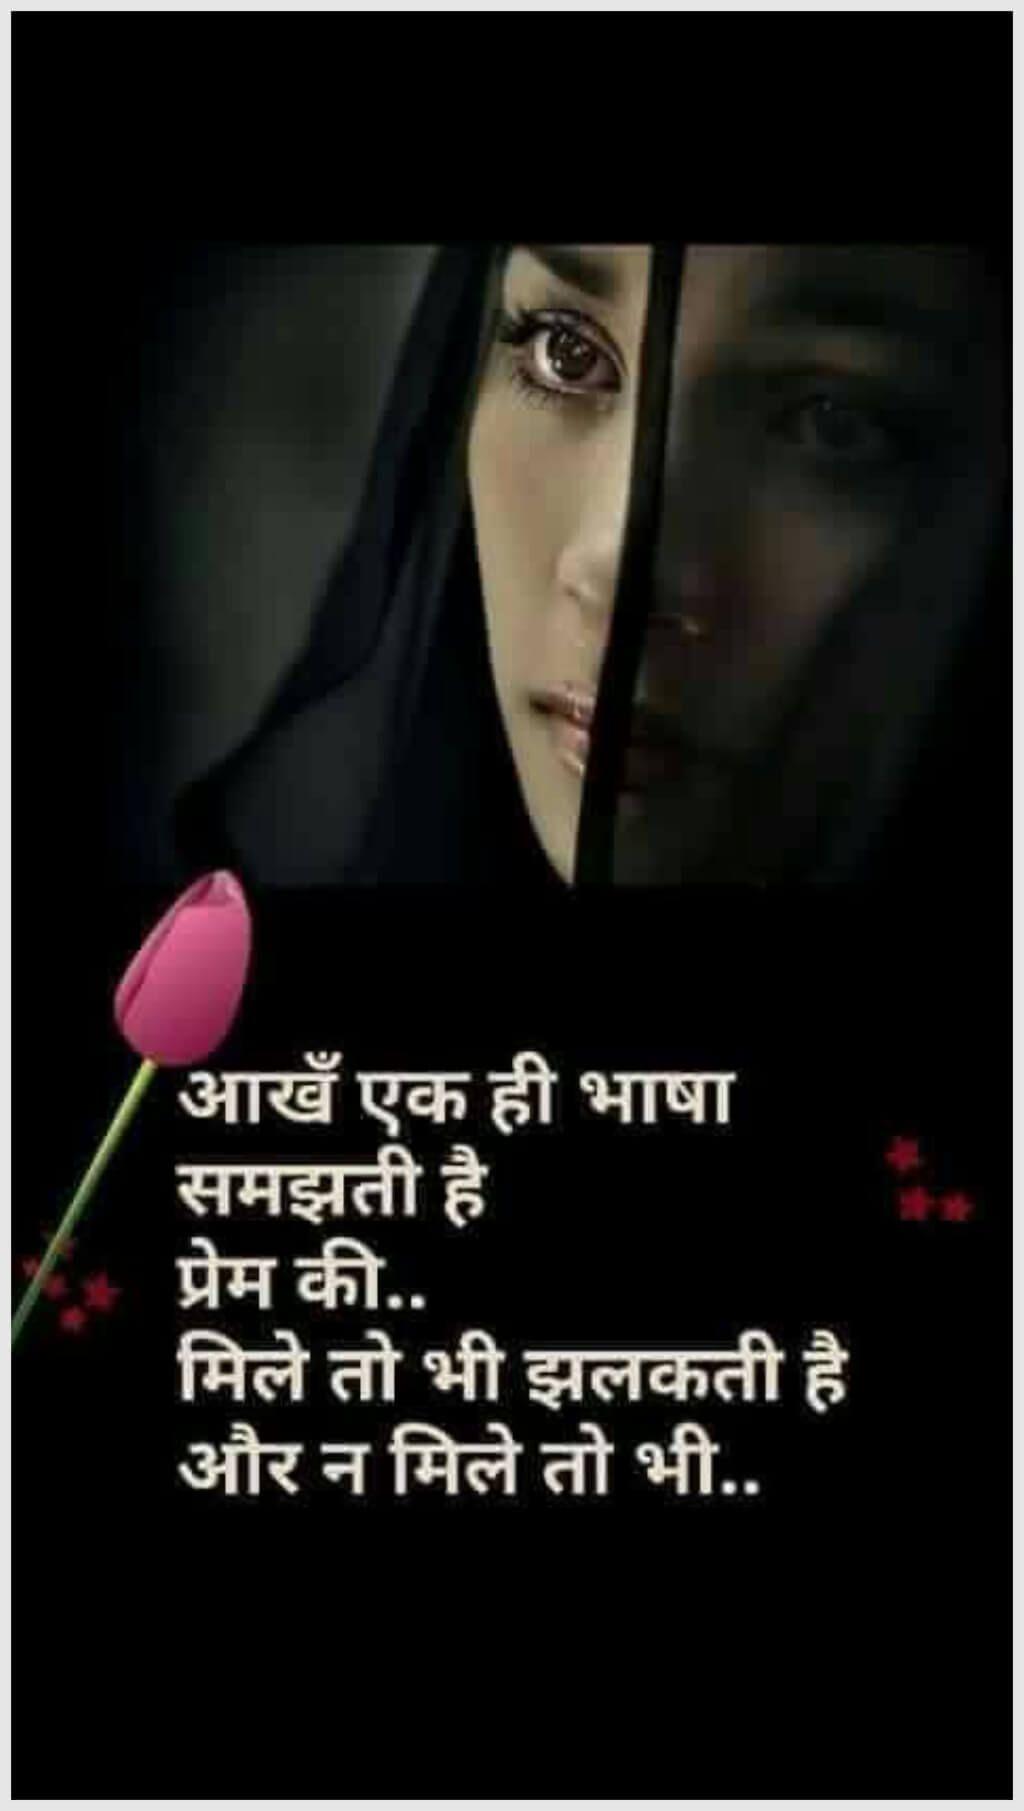 Hindi Shayari Image,Hindi Love Shayari, shayari meaning